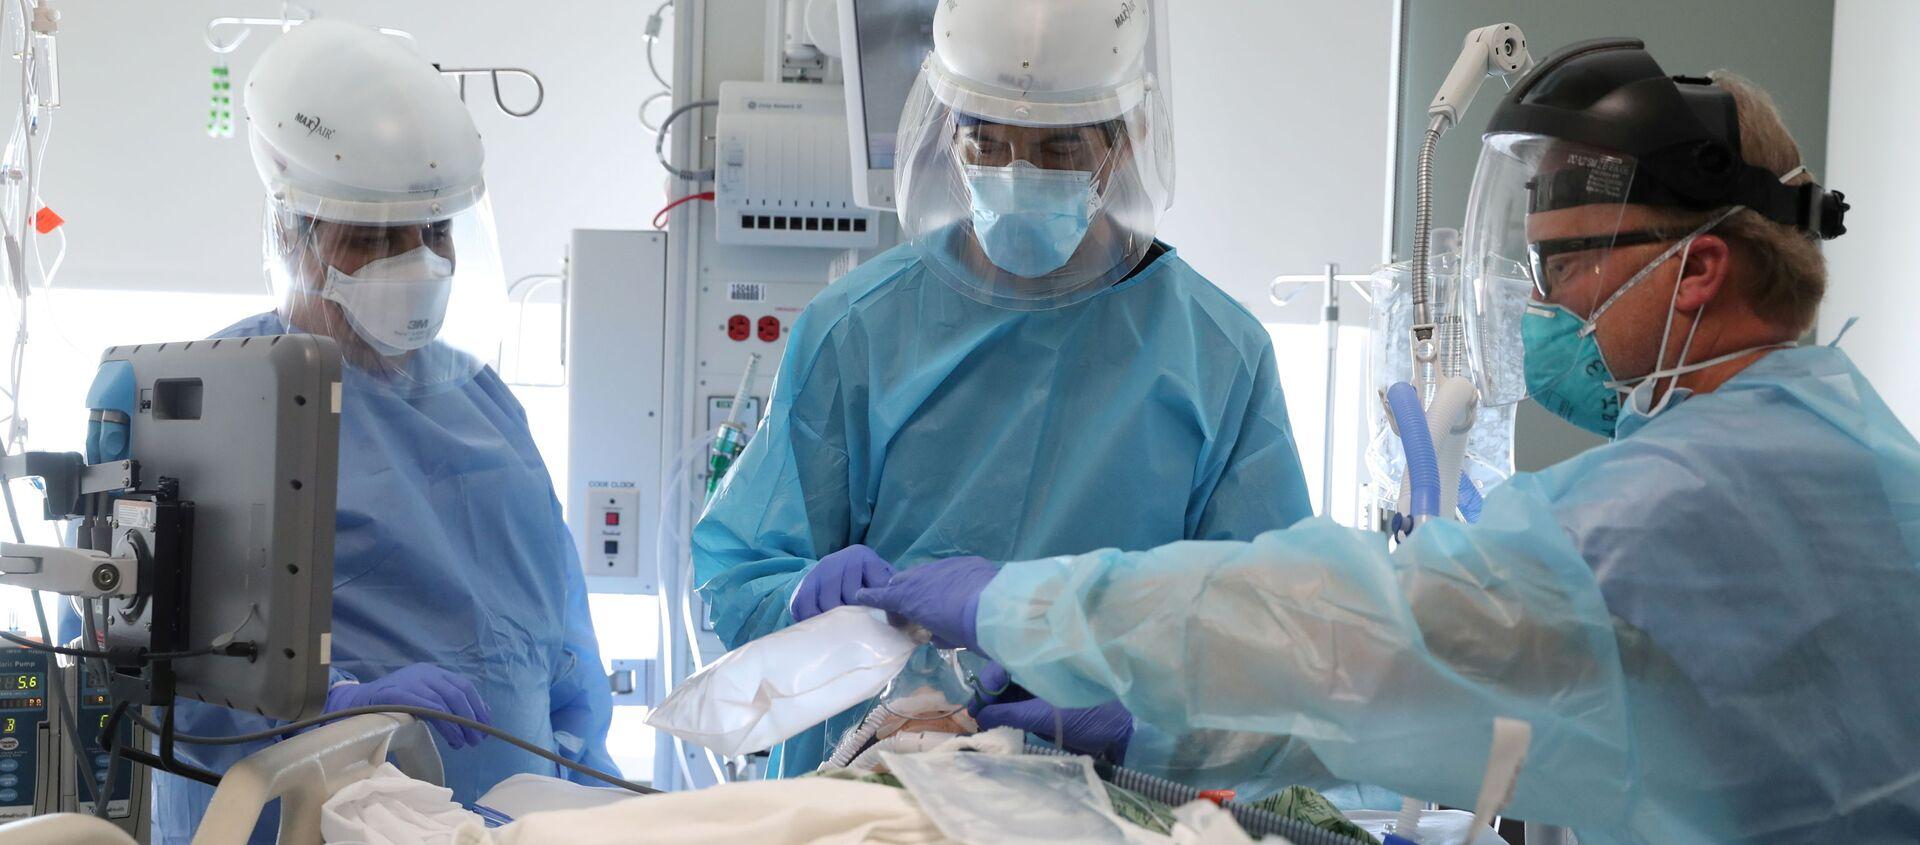 Dr. Dan Ponticiello, 43, and Dr. Gabriel Gomez, 40, intubate a coronavirus disease (COVID-19) patient in the COVID-19 ICU at Providence Mission Hospital in Mission Viejo, California, U.S., January 8, 2021. - Sputnik International, 1920, 16.02.2021